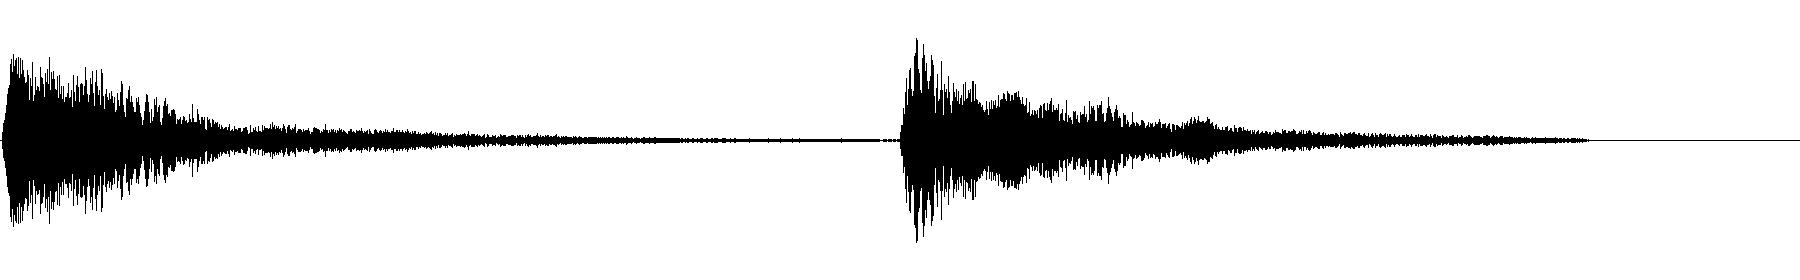 hm 122 g epiano23